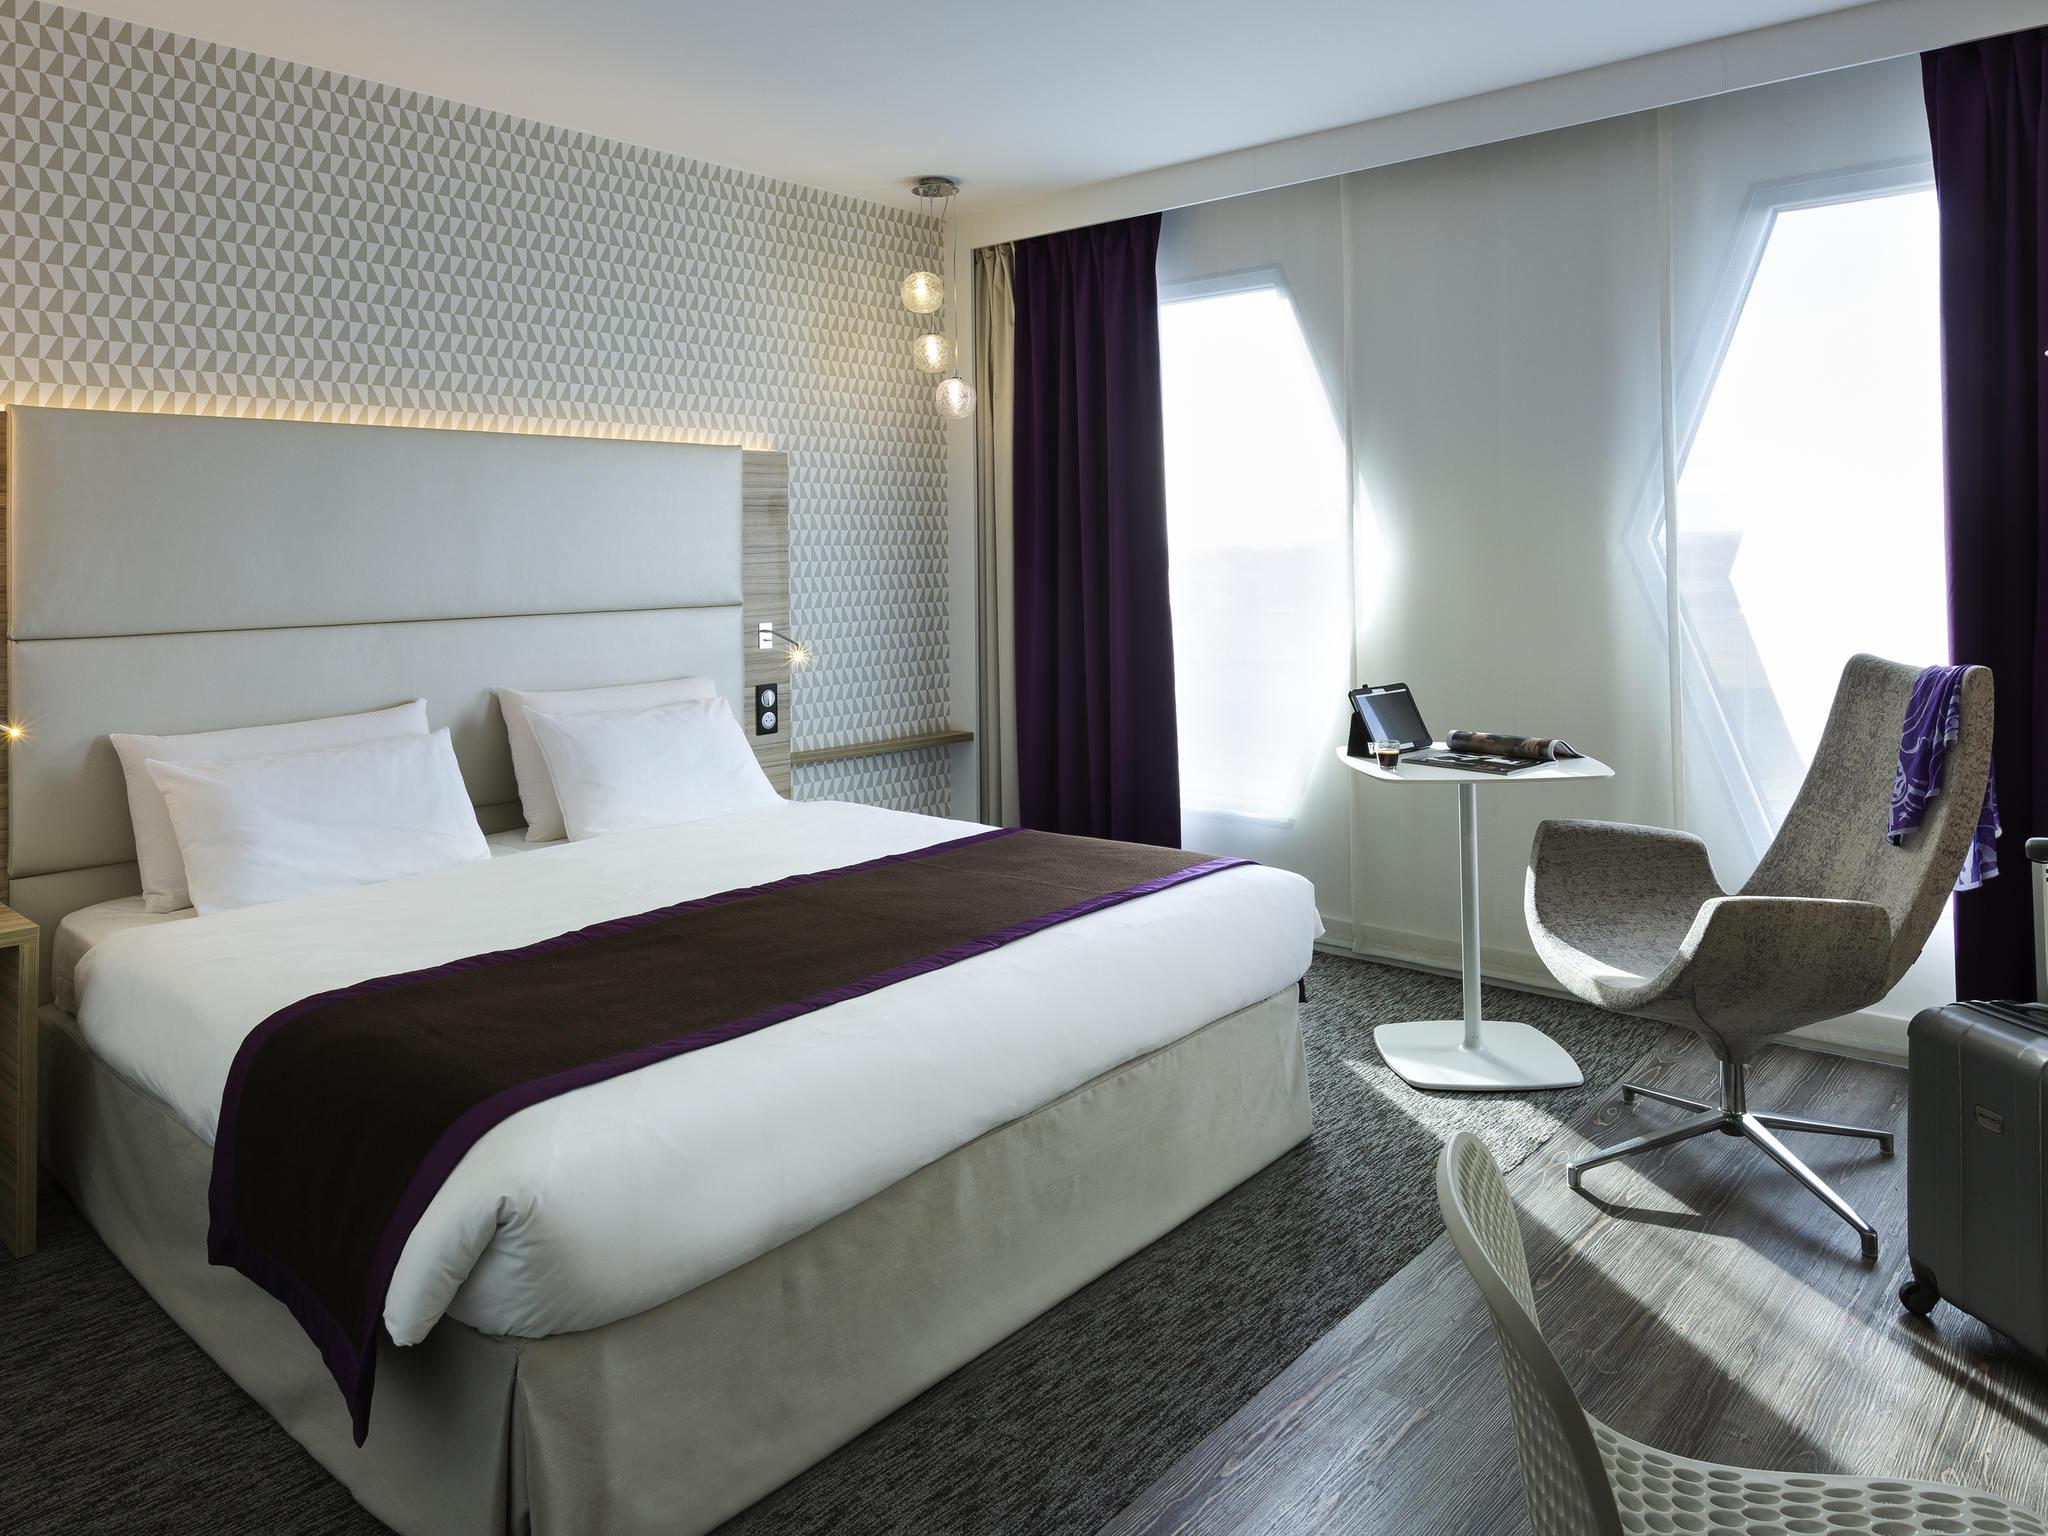 ホテル – Hôtel Mercure Paris Orly Rungis Aéroport